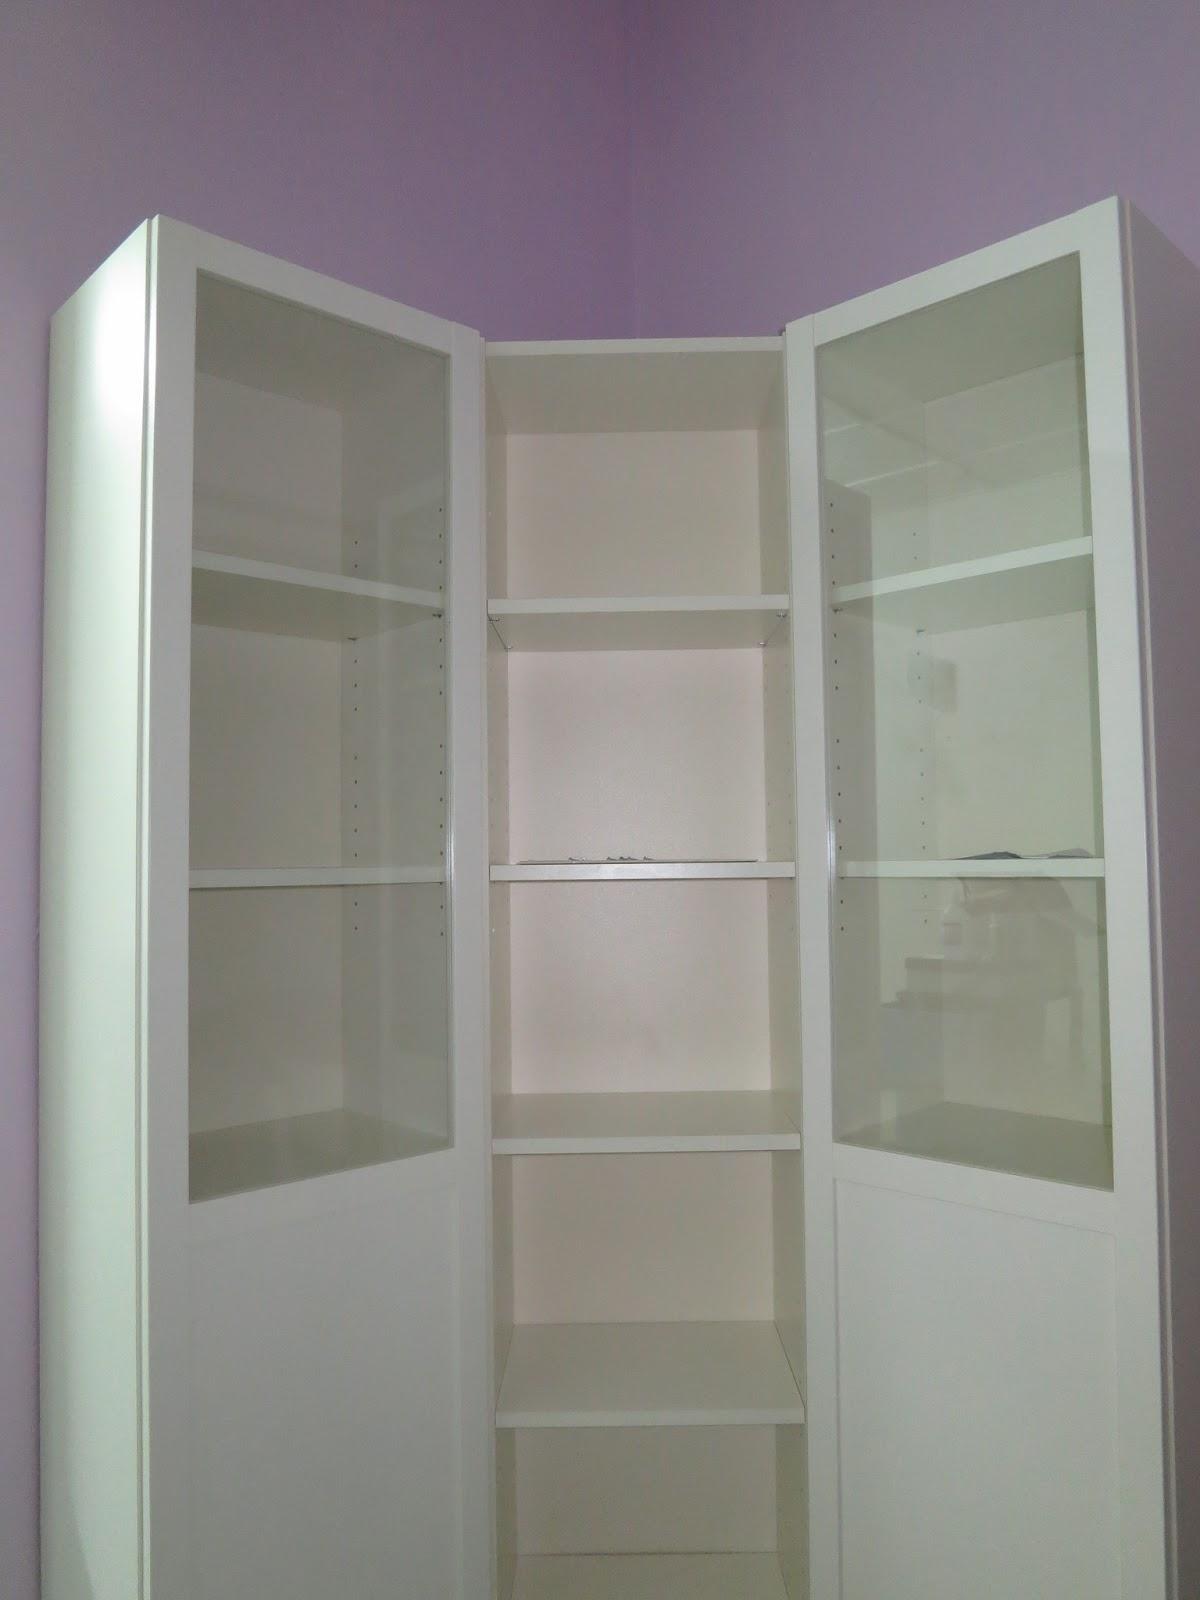 Tips Jimat 5 Kalau Teringin Nak Beli Perabot Corner Di Ikea Rak Buku Adalah Jawapan Termurah Wardrobe Mahal Kitchen Cabinet Pun